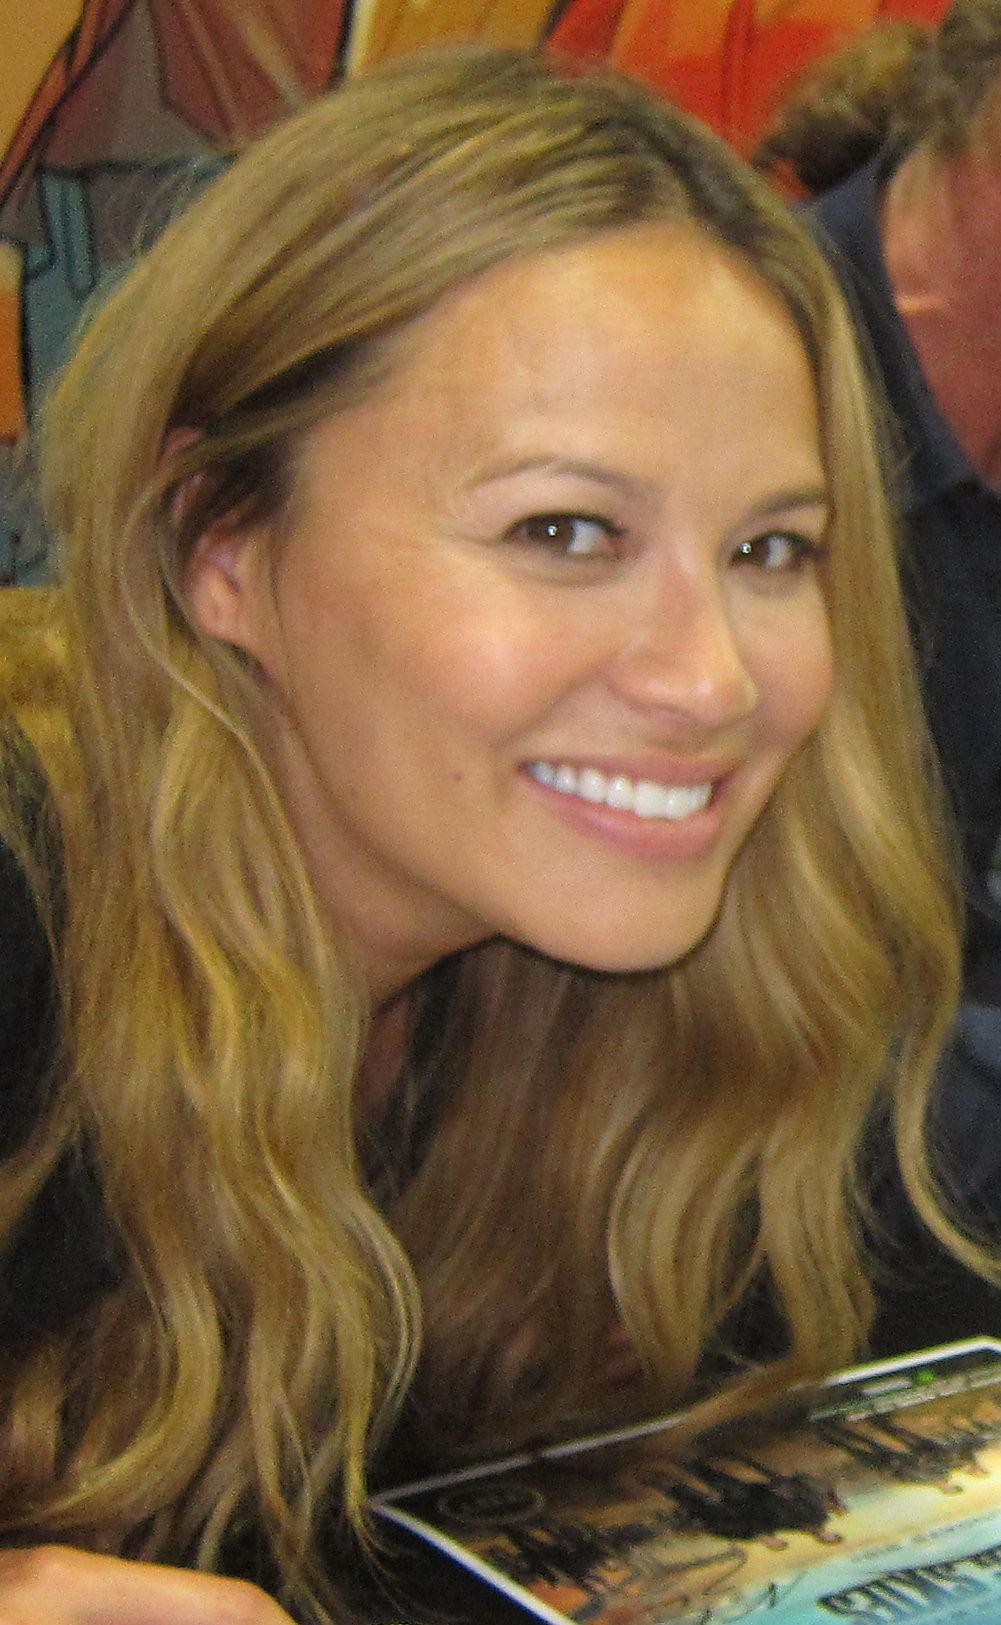 Photo of Moon Bloodgood: American actress